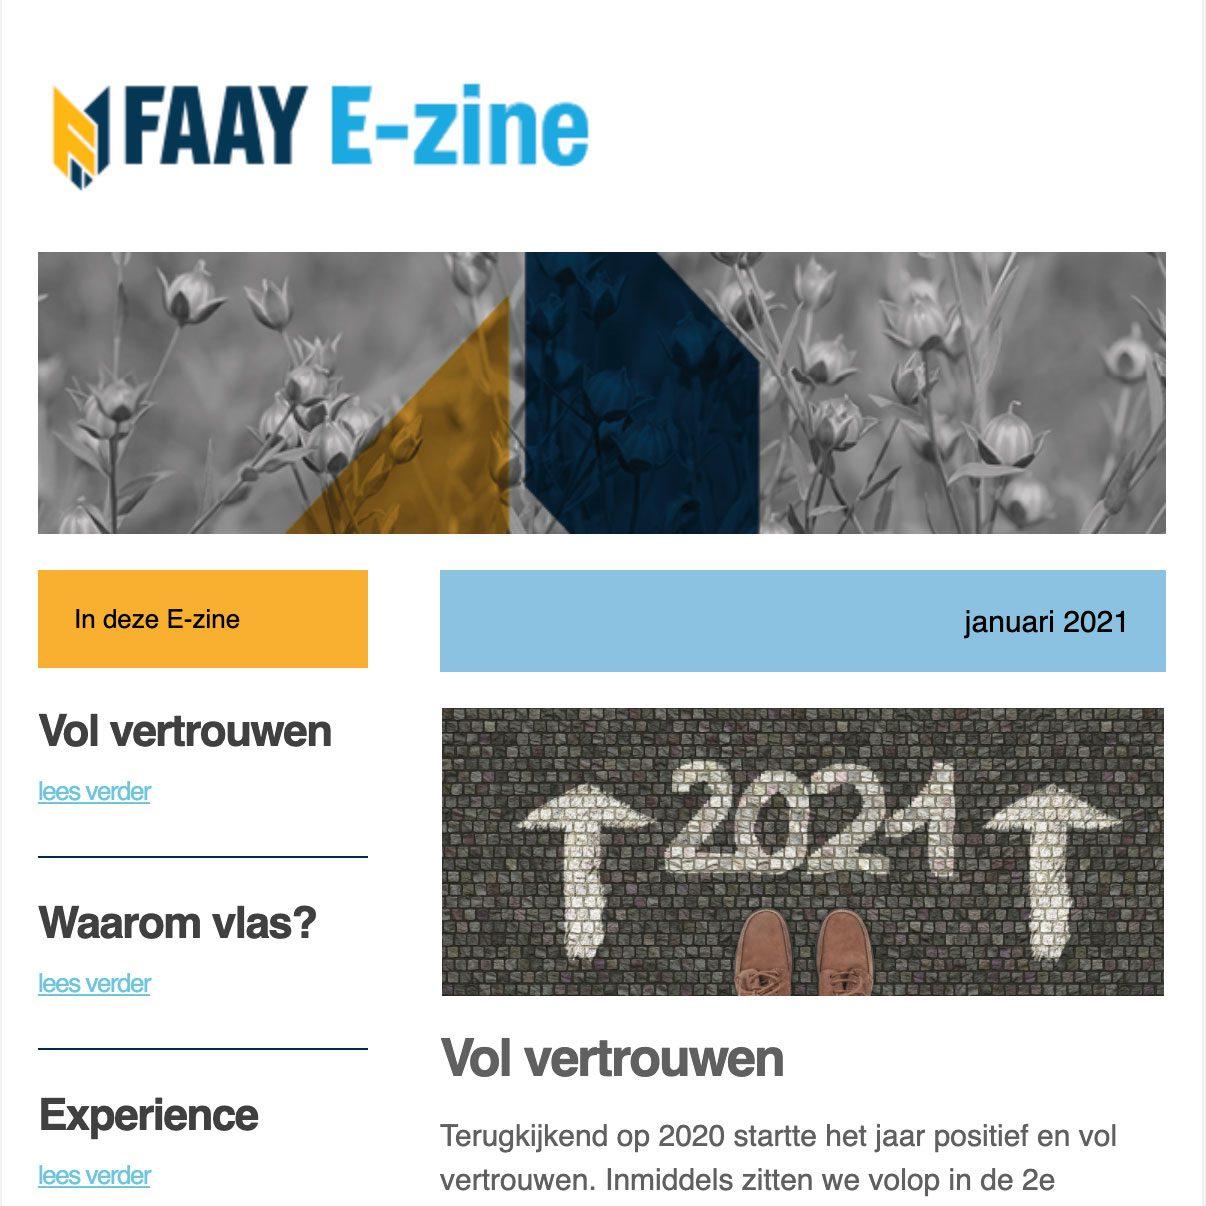 Faay-Ezine-Jan2021